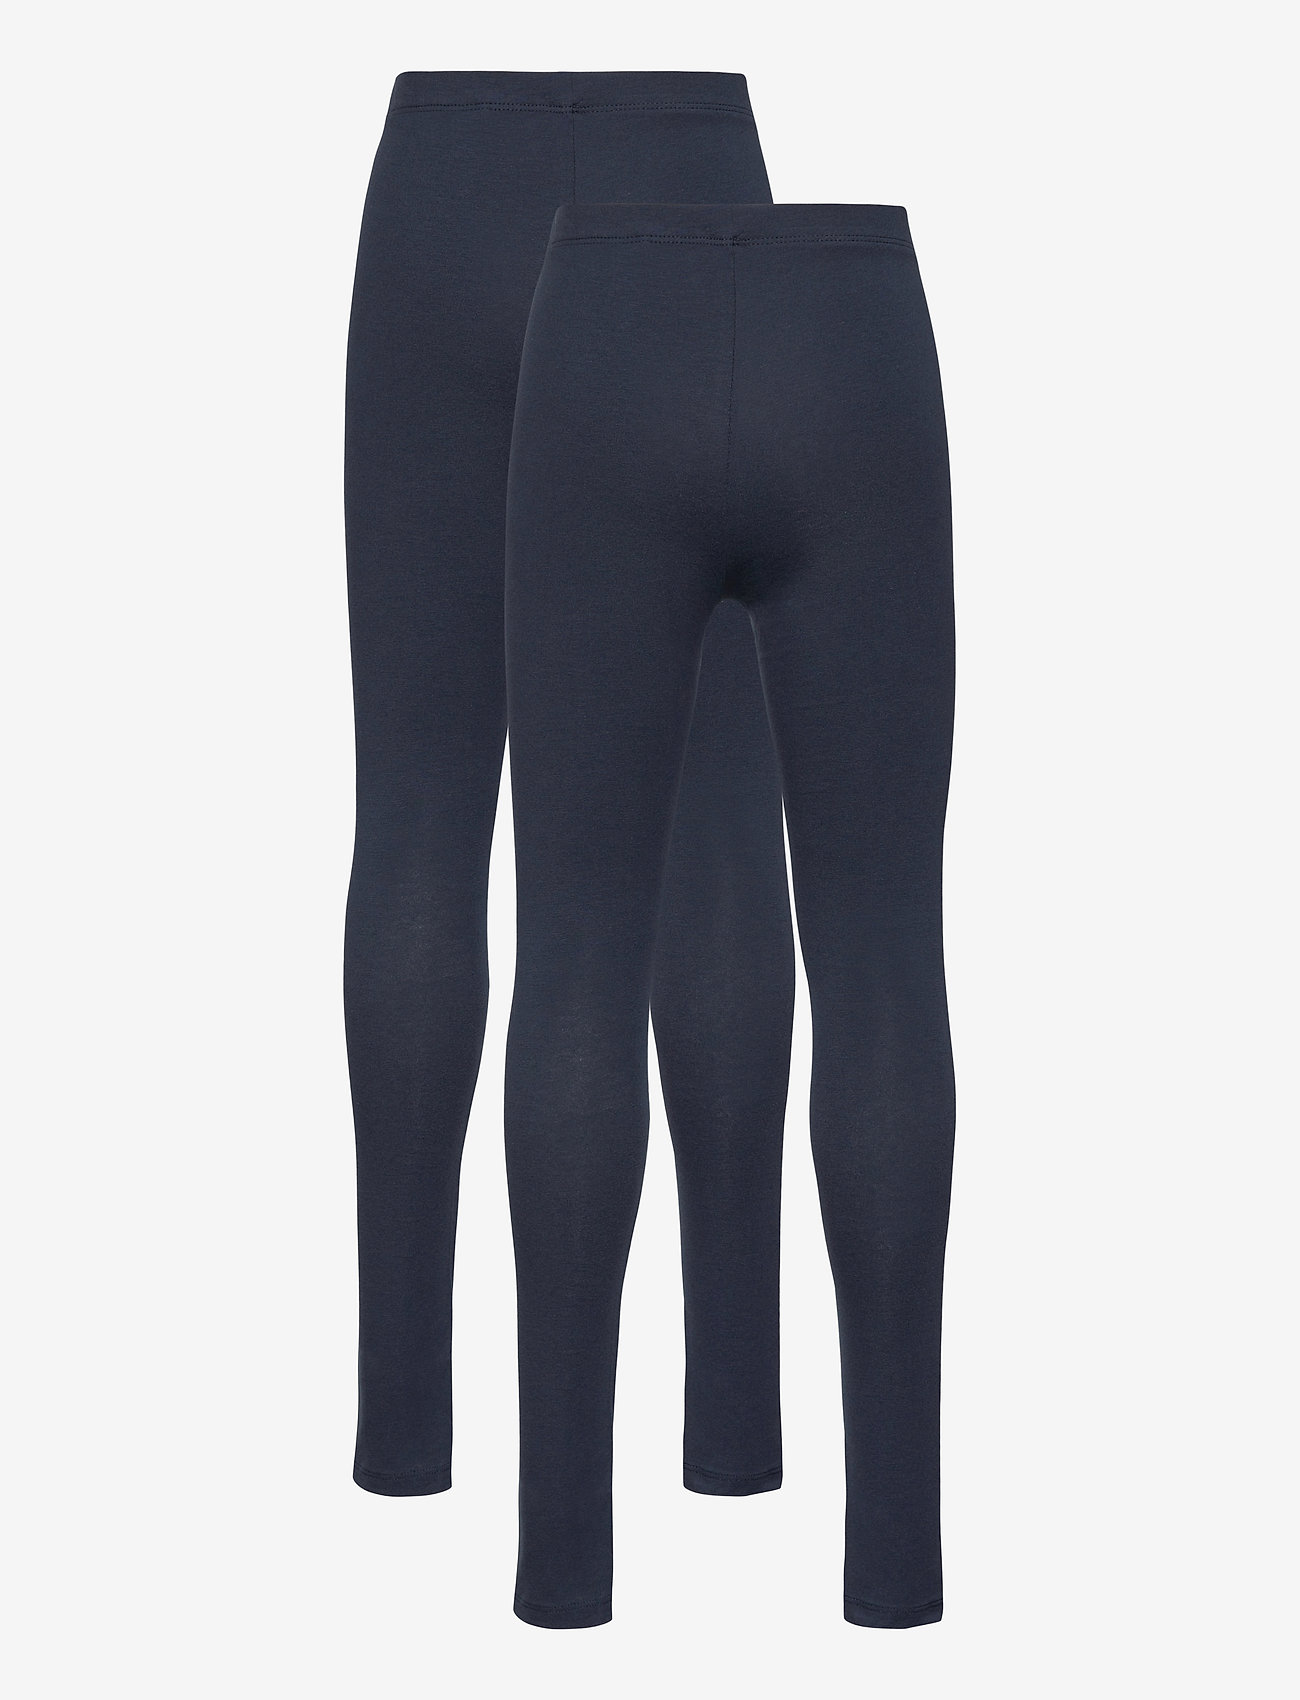 name it - NKFVIVIAN 2P LEGGING NOOS - leggings - dark sapphire - 1